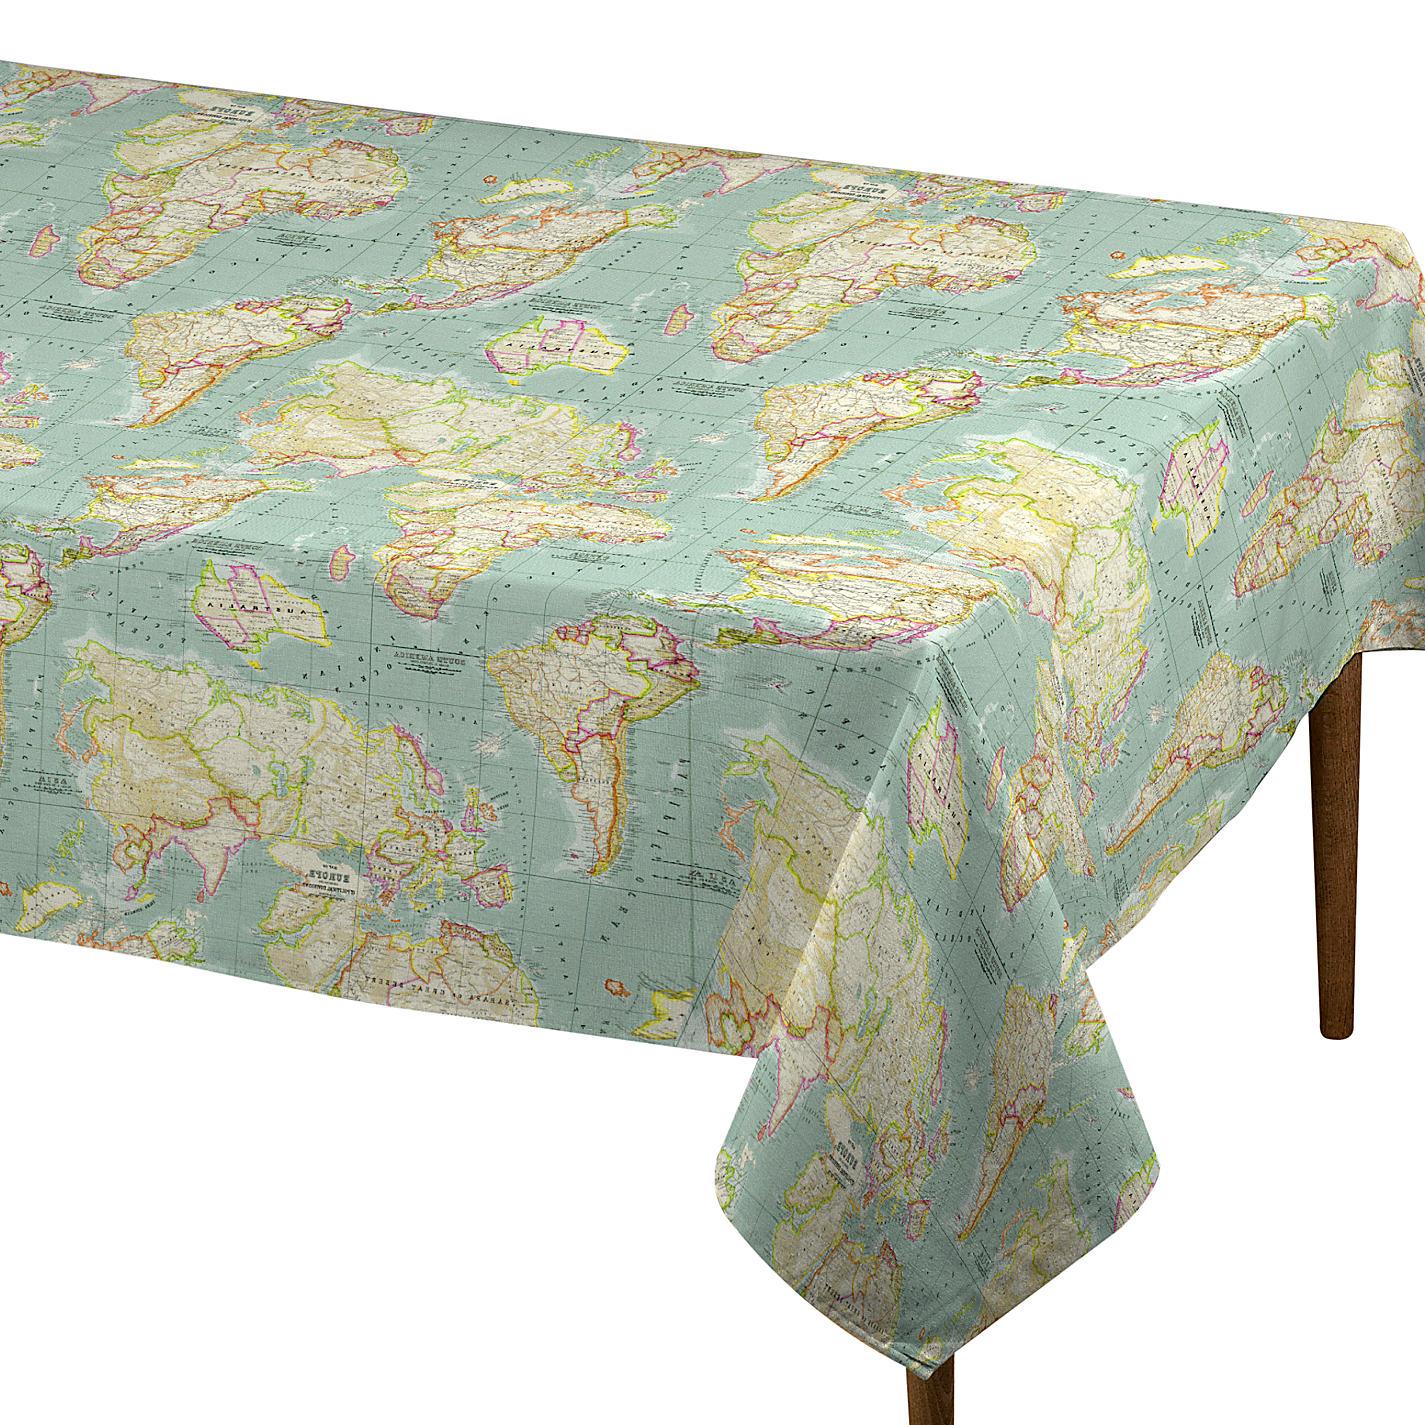 ... Buy John Lewis World Map Teflon Coated Tablecloth Fabric Online At  Johnlewis.com ...